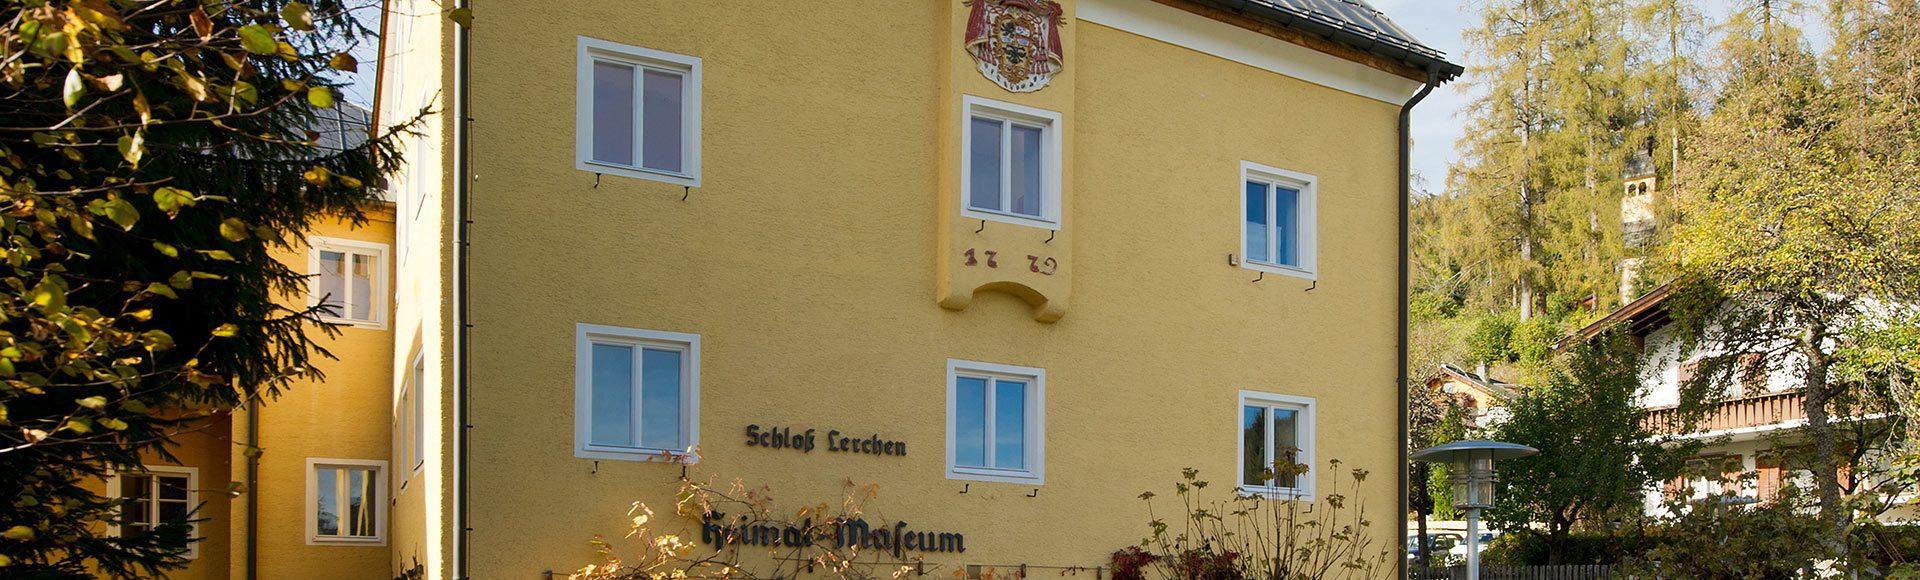 Museum Schloss Lerchen Radstaedter Museumsverein 1